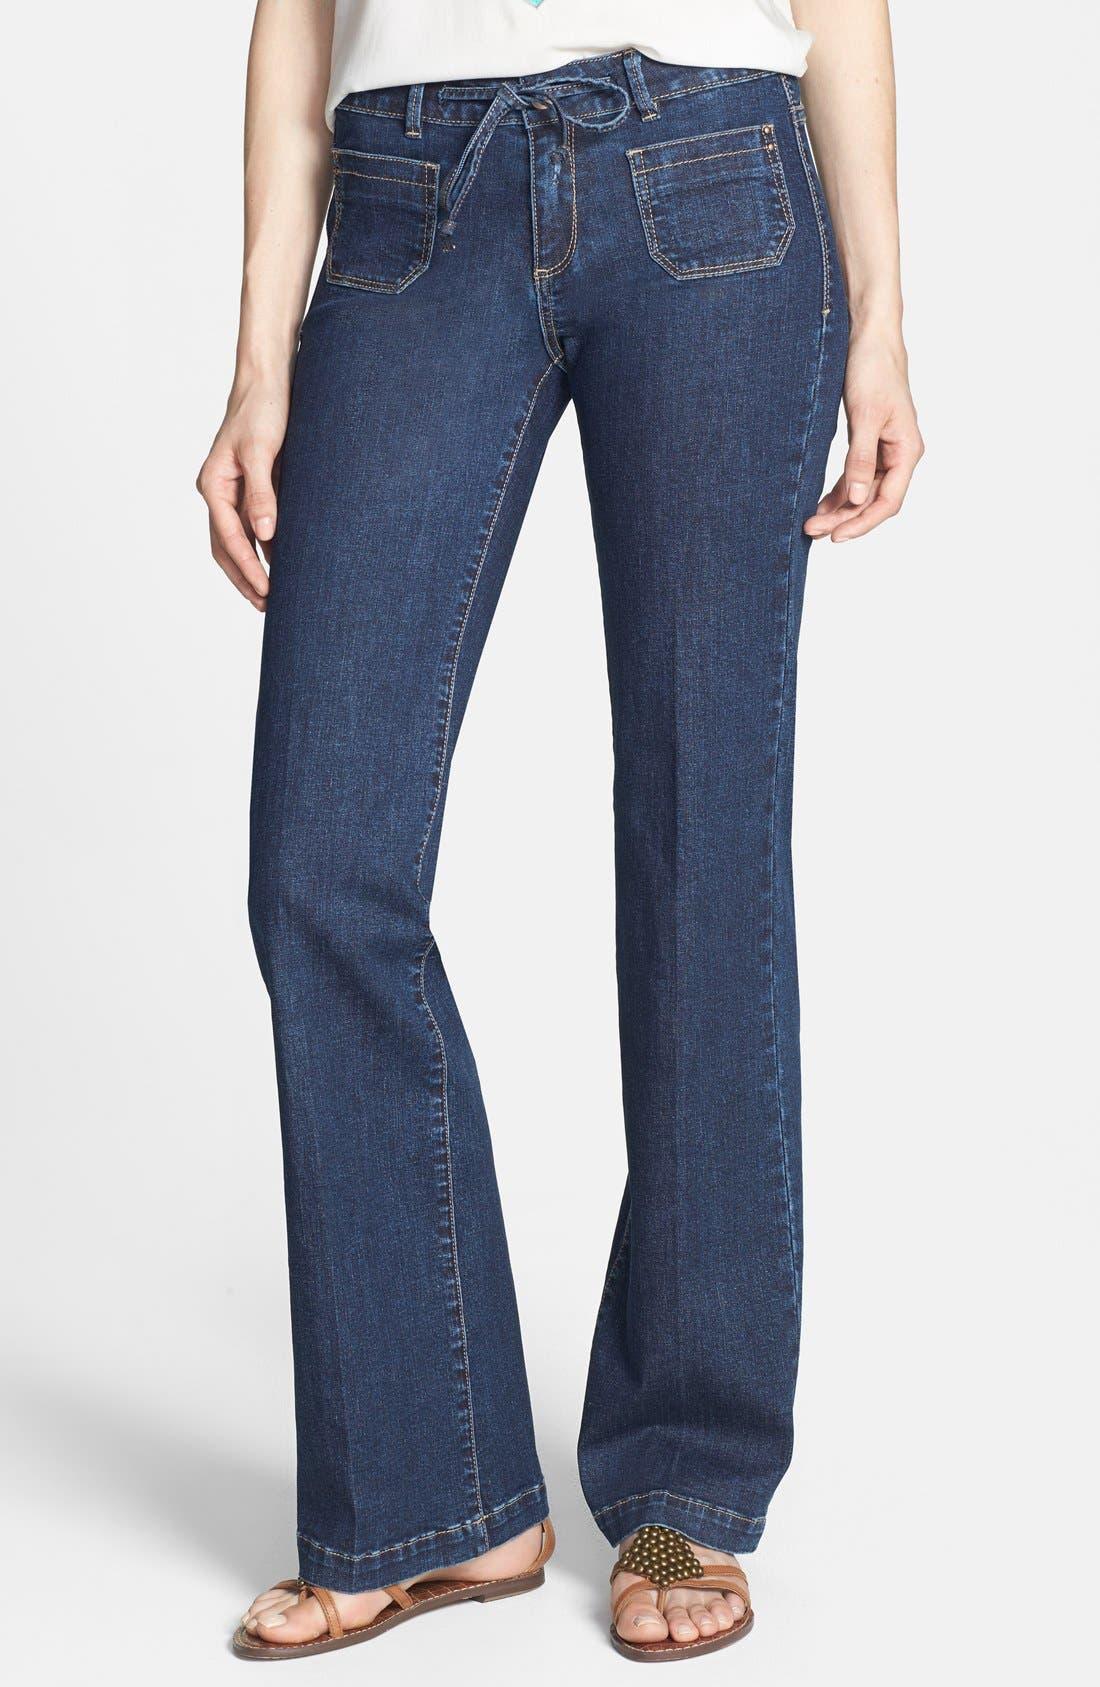 Alternate Image 1 Selected - HART Denim 'Pheona' Wide Leg Trouser Jeans (Carbon) (Juniors)